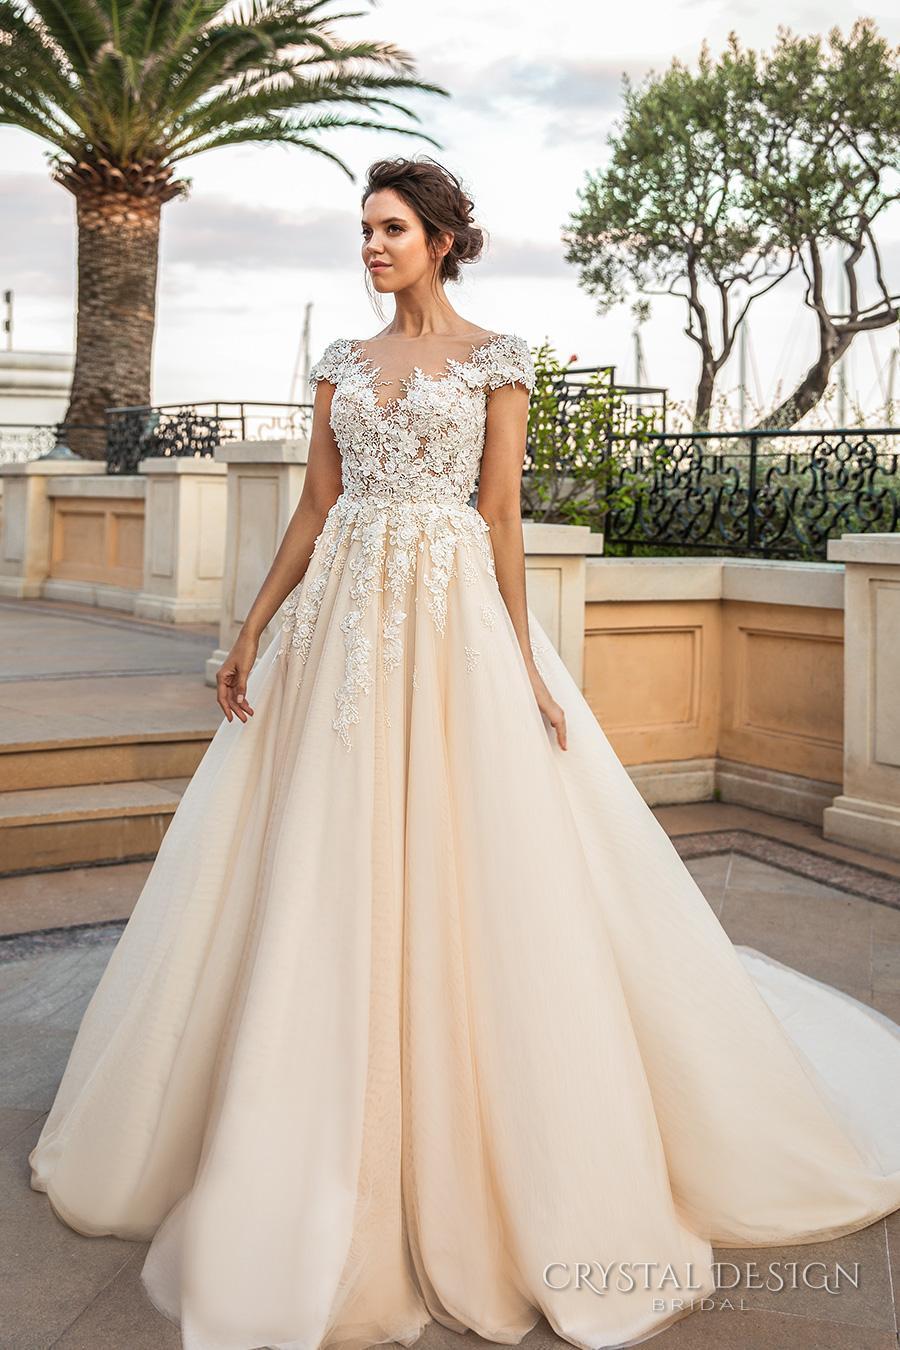 Romantic Princess Ivory Cream Wedding Dresses 2018 Crystal Design ...